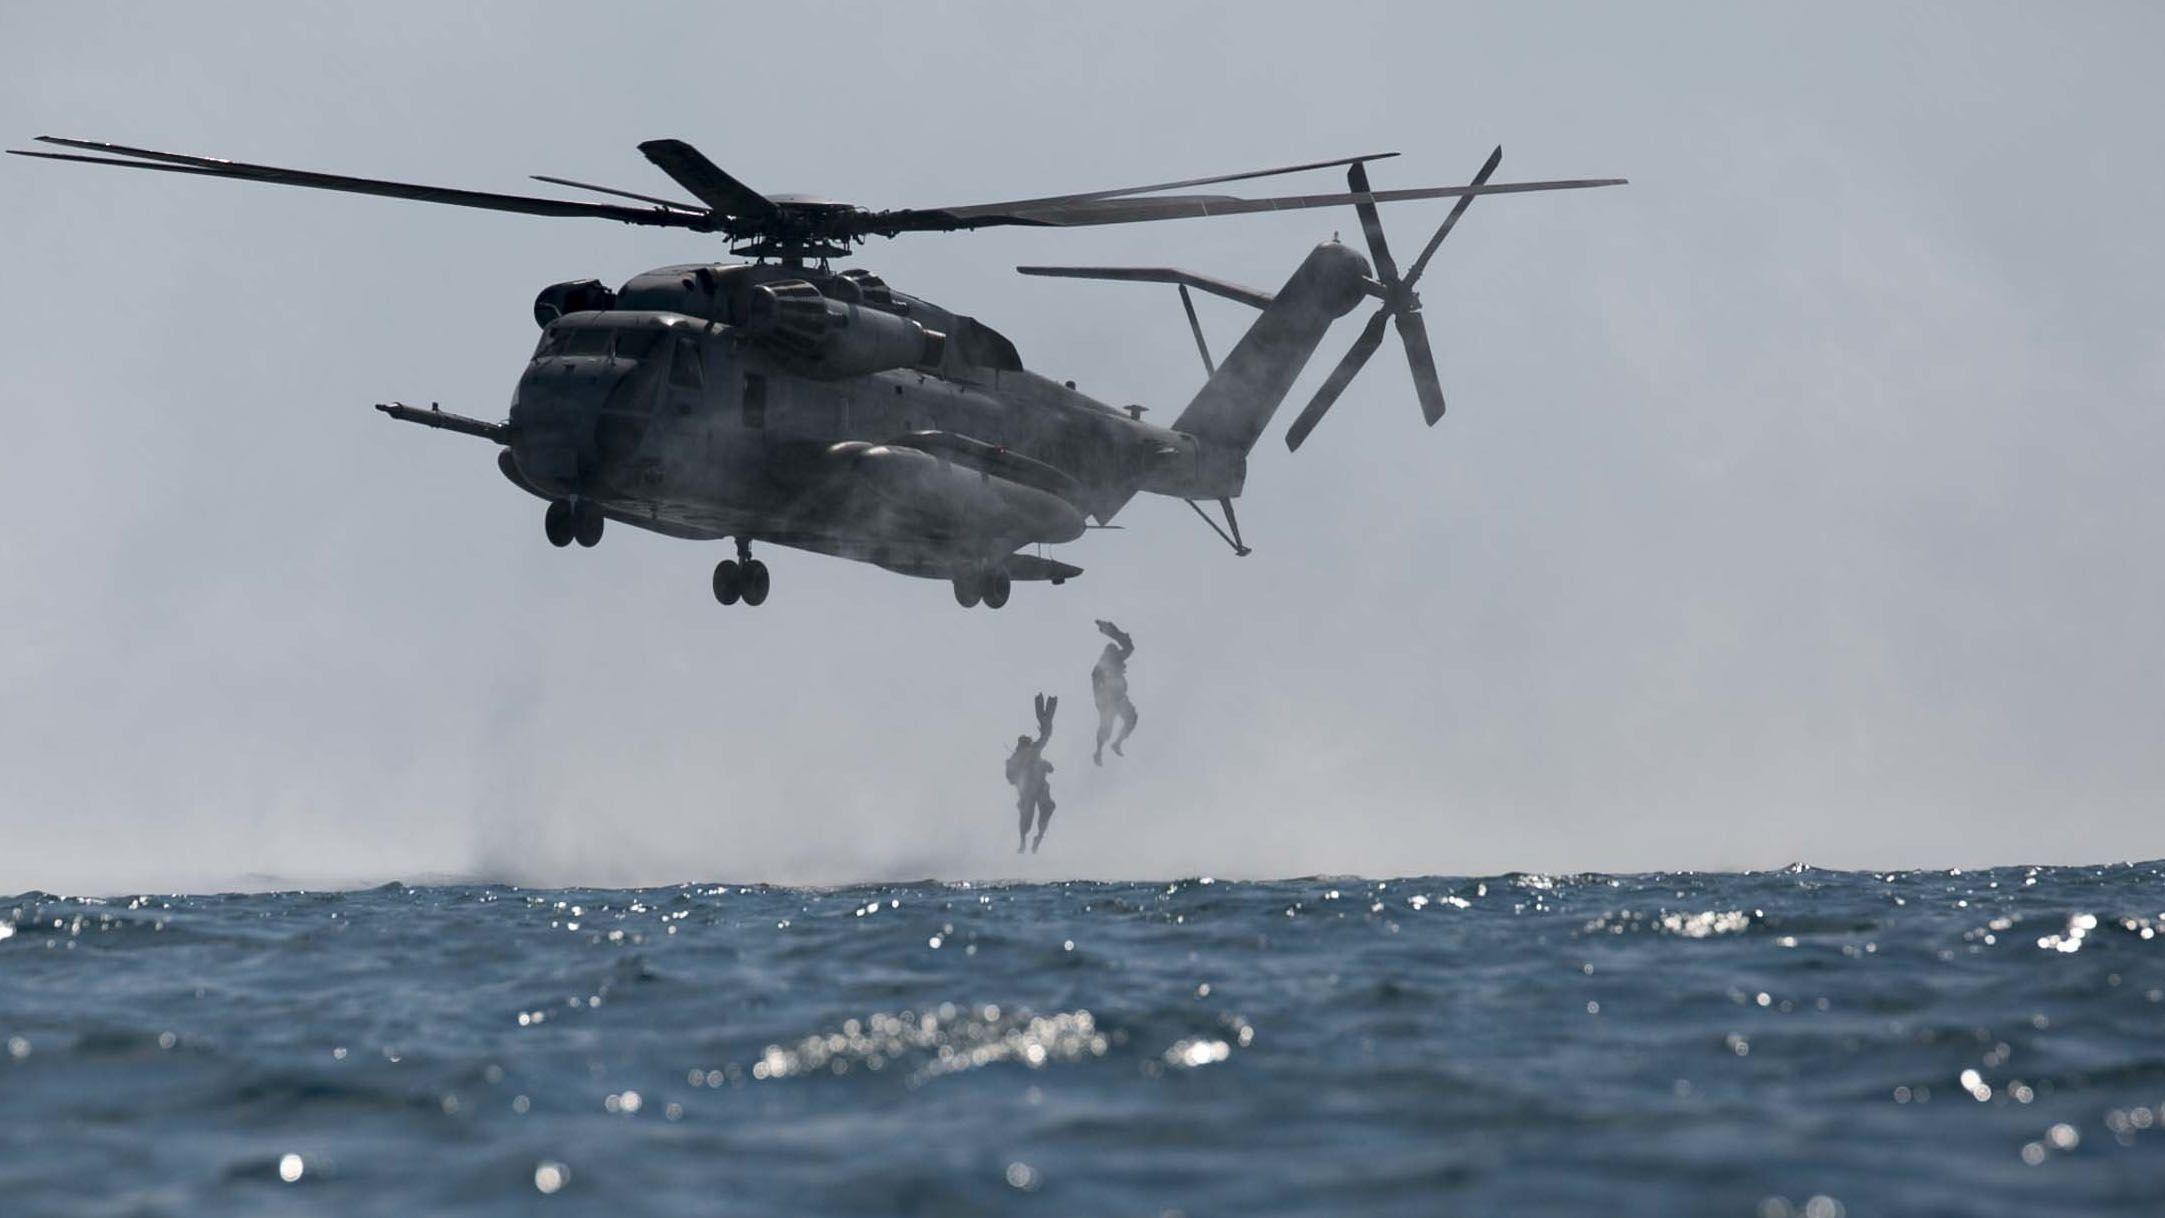 WHITE BEACH NAVAL FACILITY, Okinawa, Japan - Marines ...